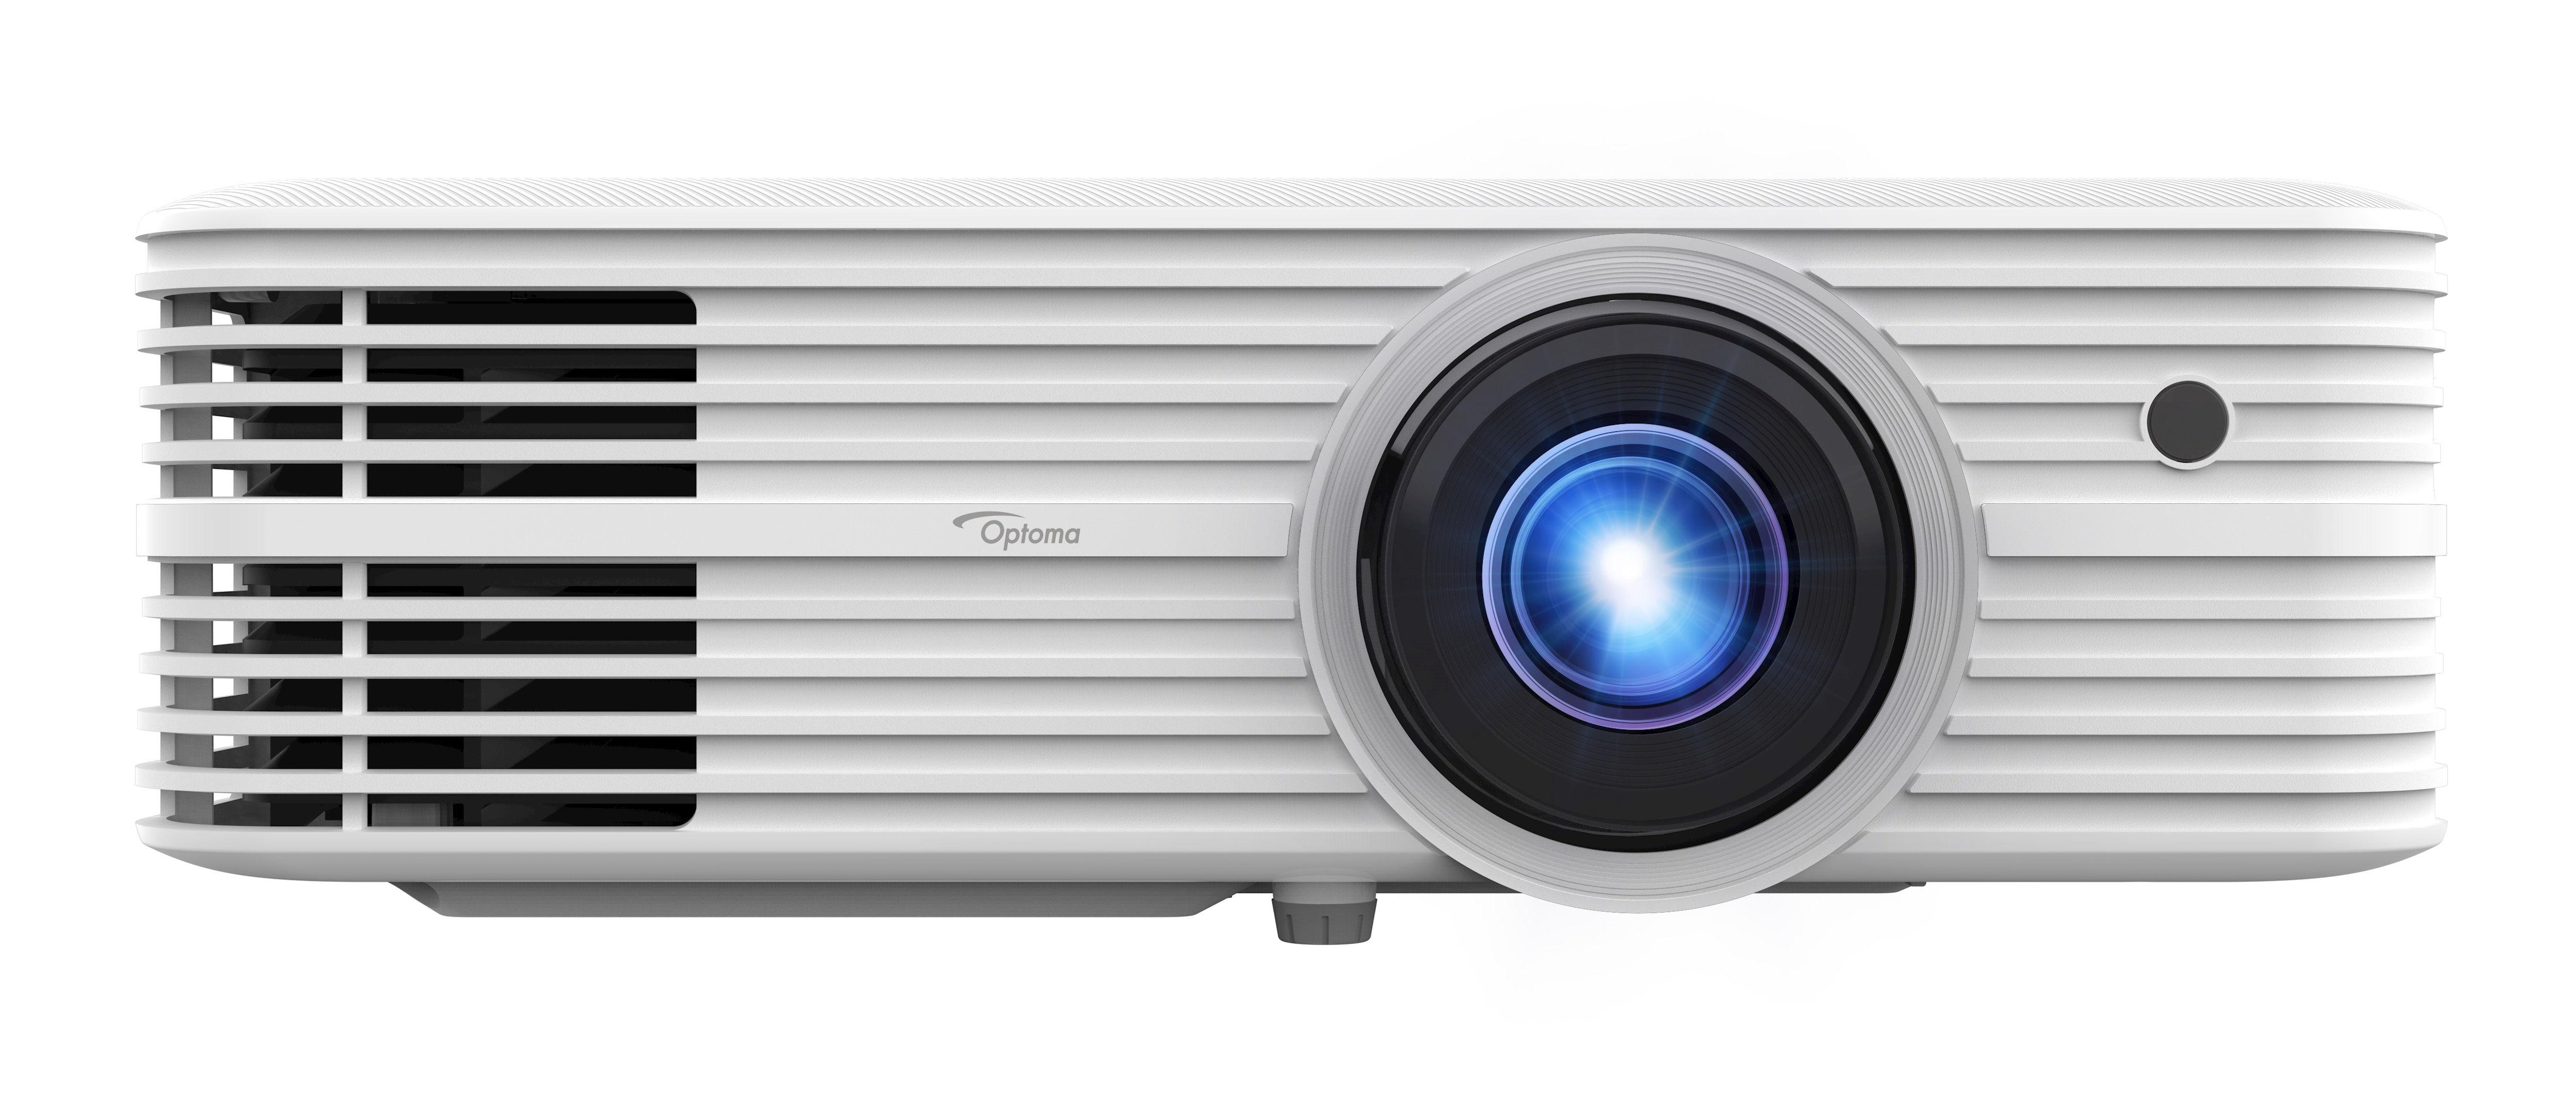 Optoma 4K550 UHD 5000 lumens Projector